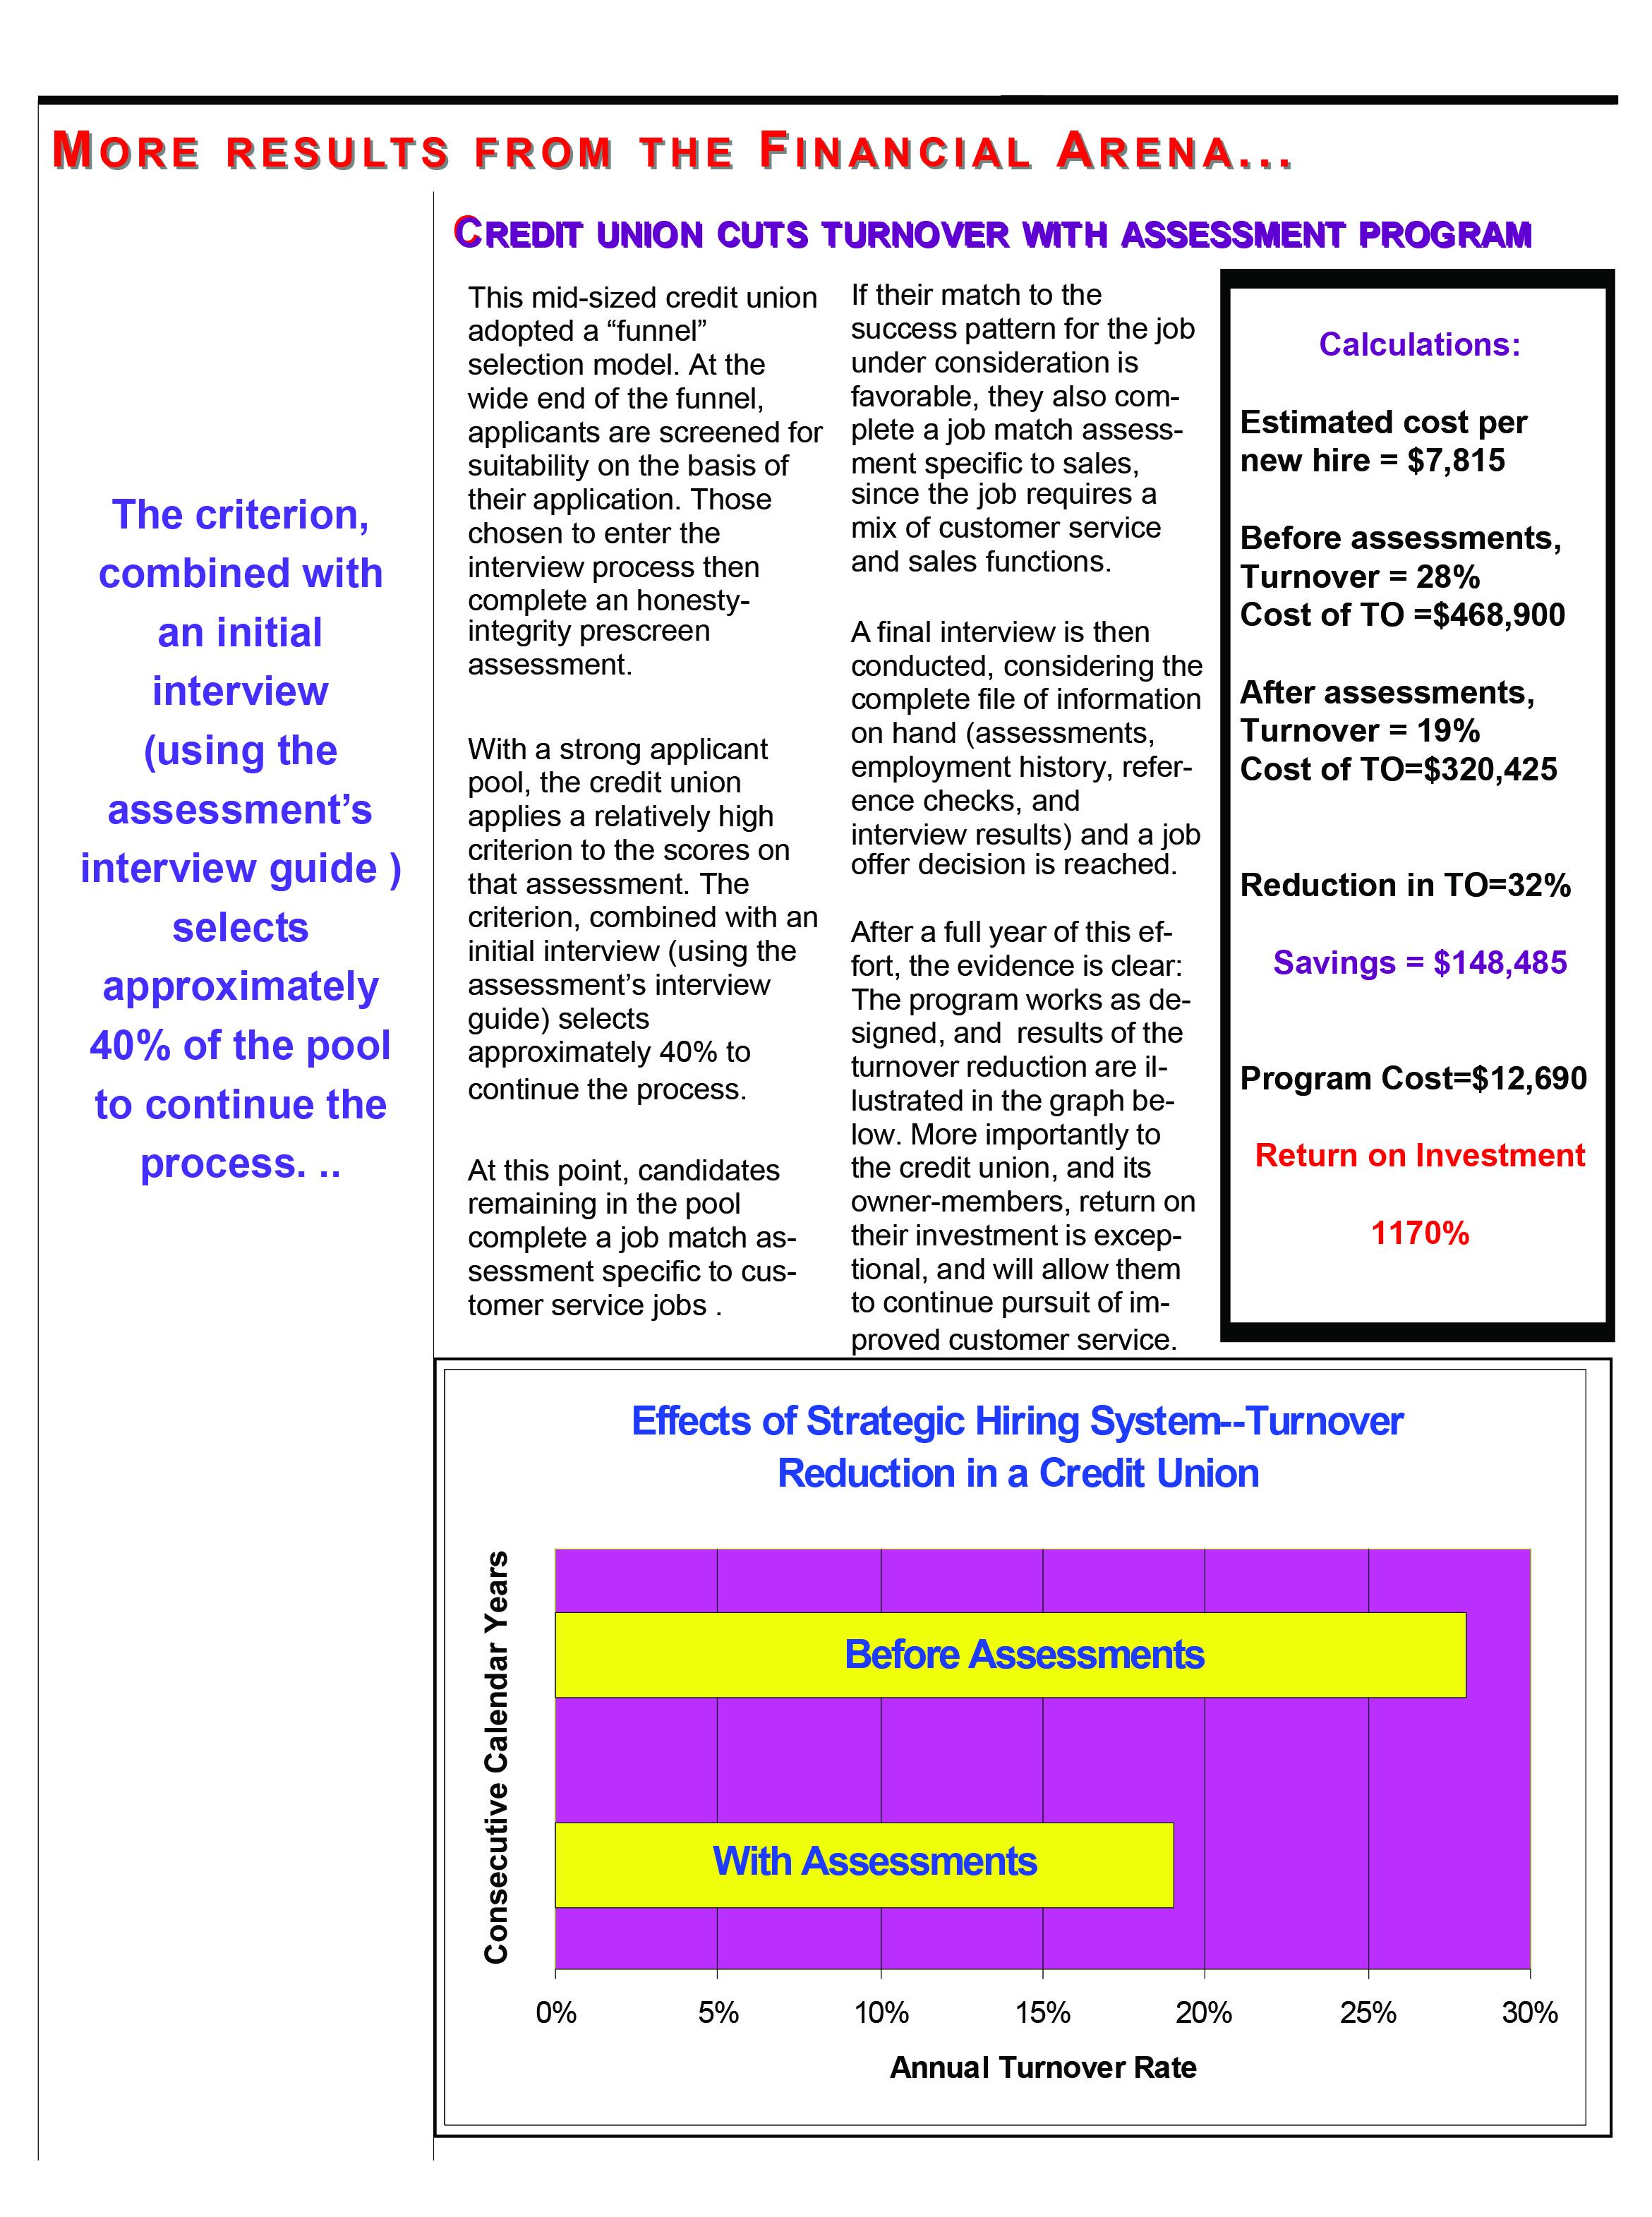 CS-Call Center-Strategic Hiring System Pays Off31.jpg